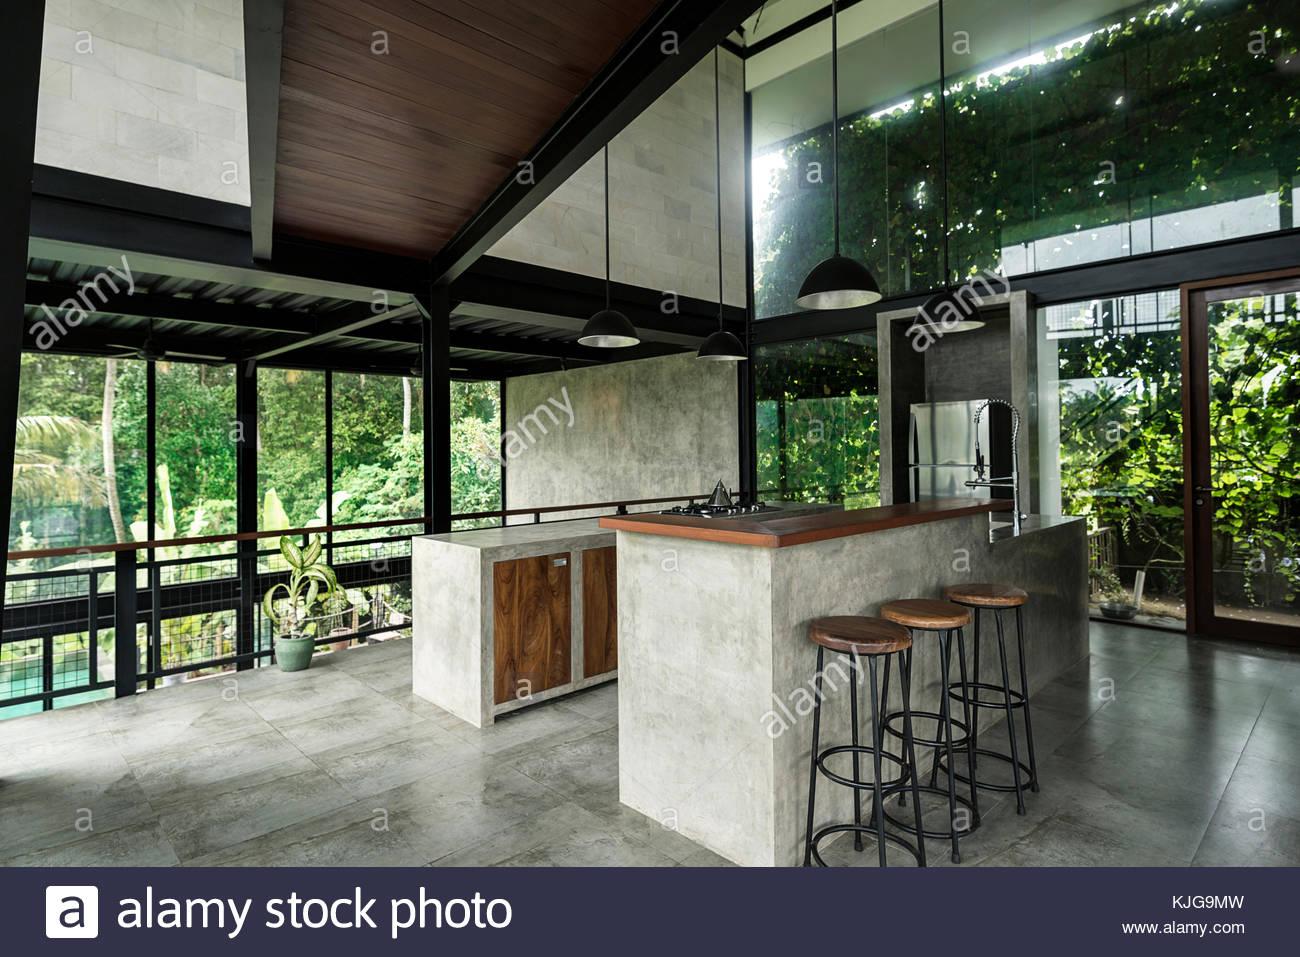 Moderna cucina minimalista nel design contemporaneo casa con ...